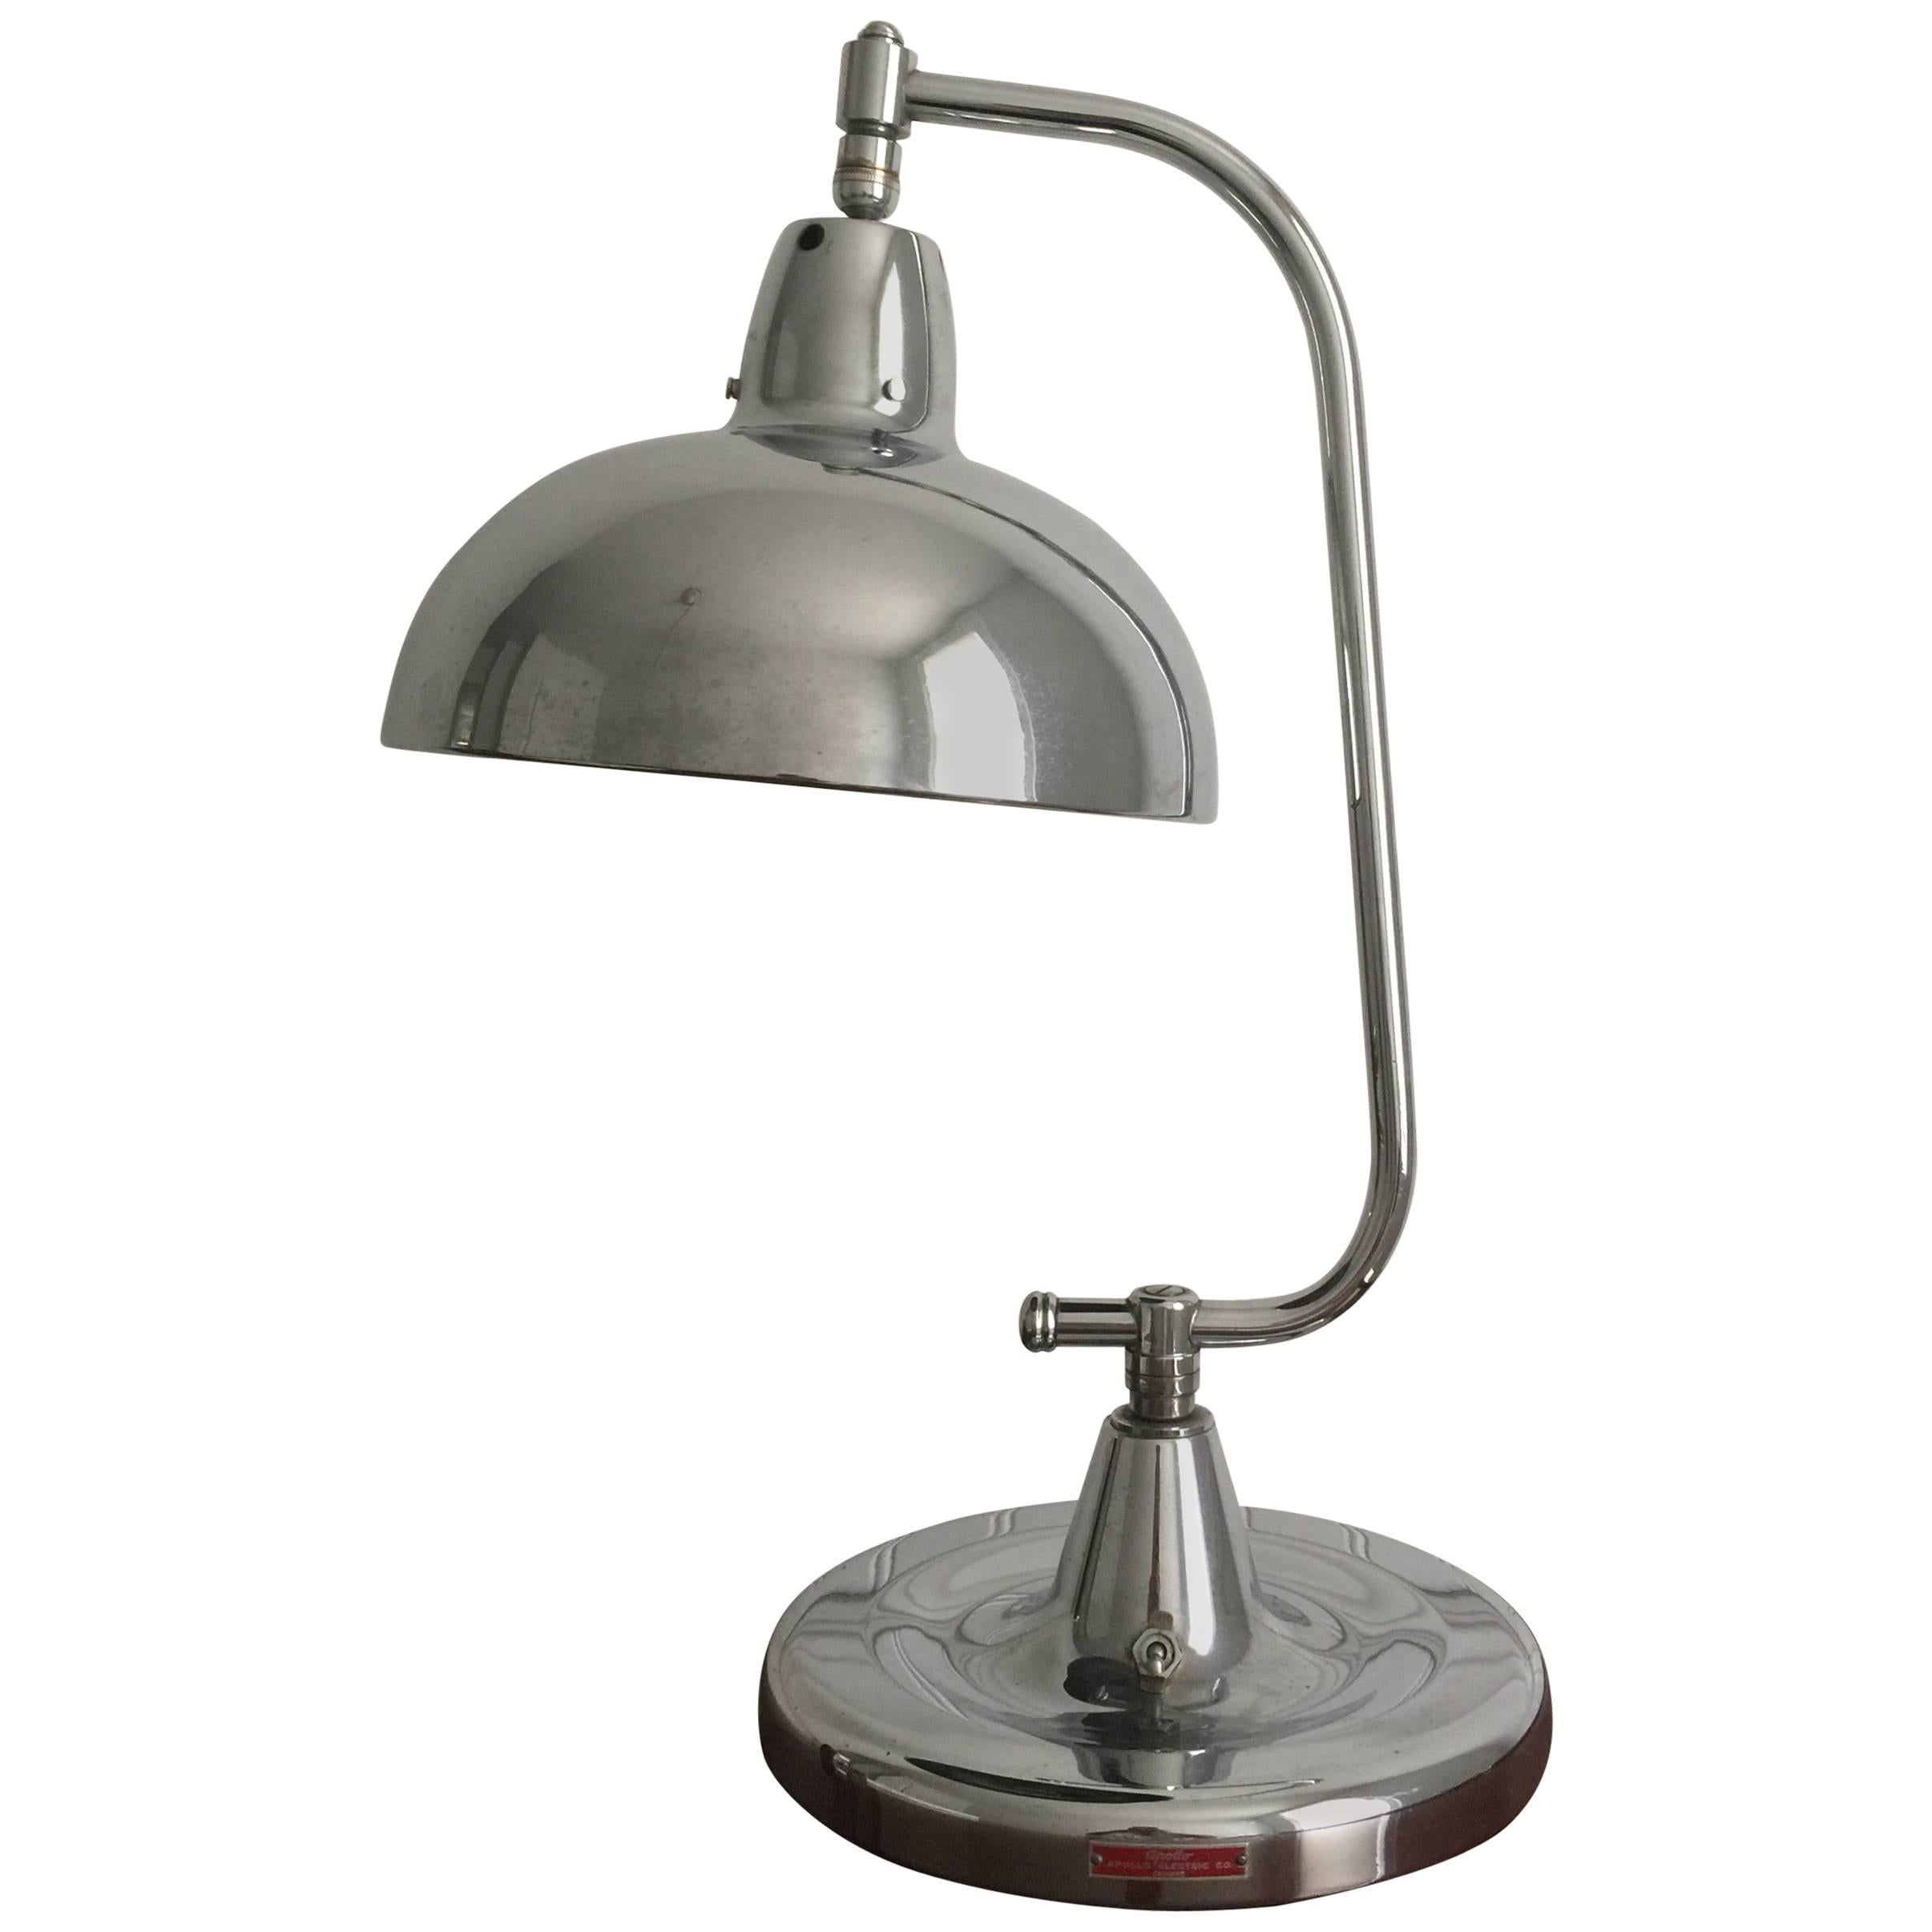 1940s Chrome Jeweler's Lamp